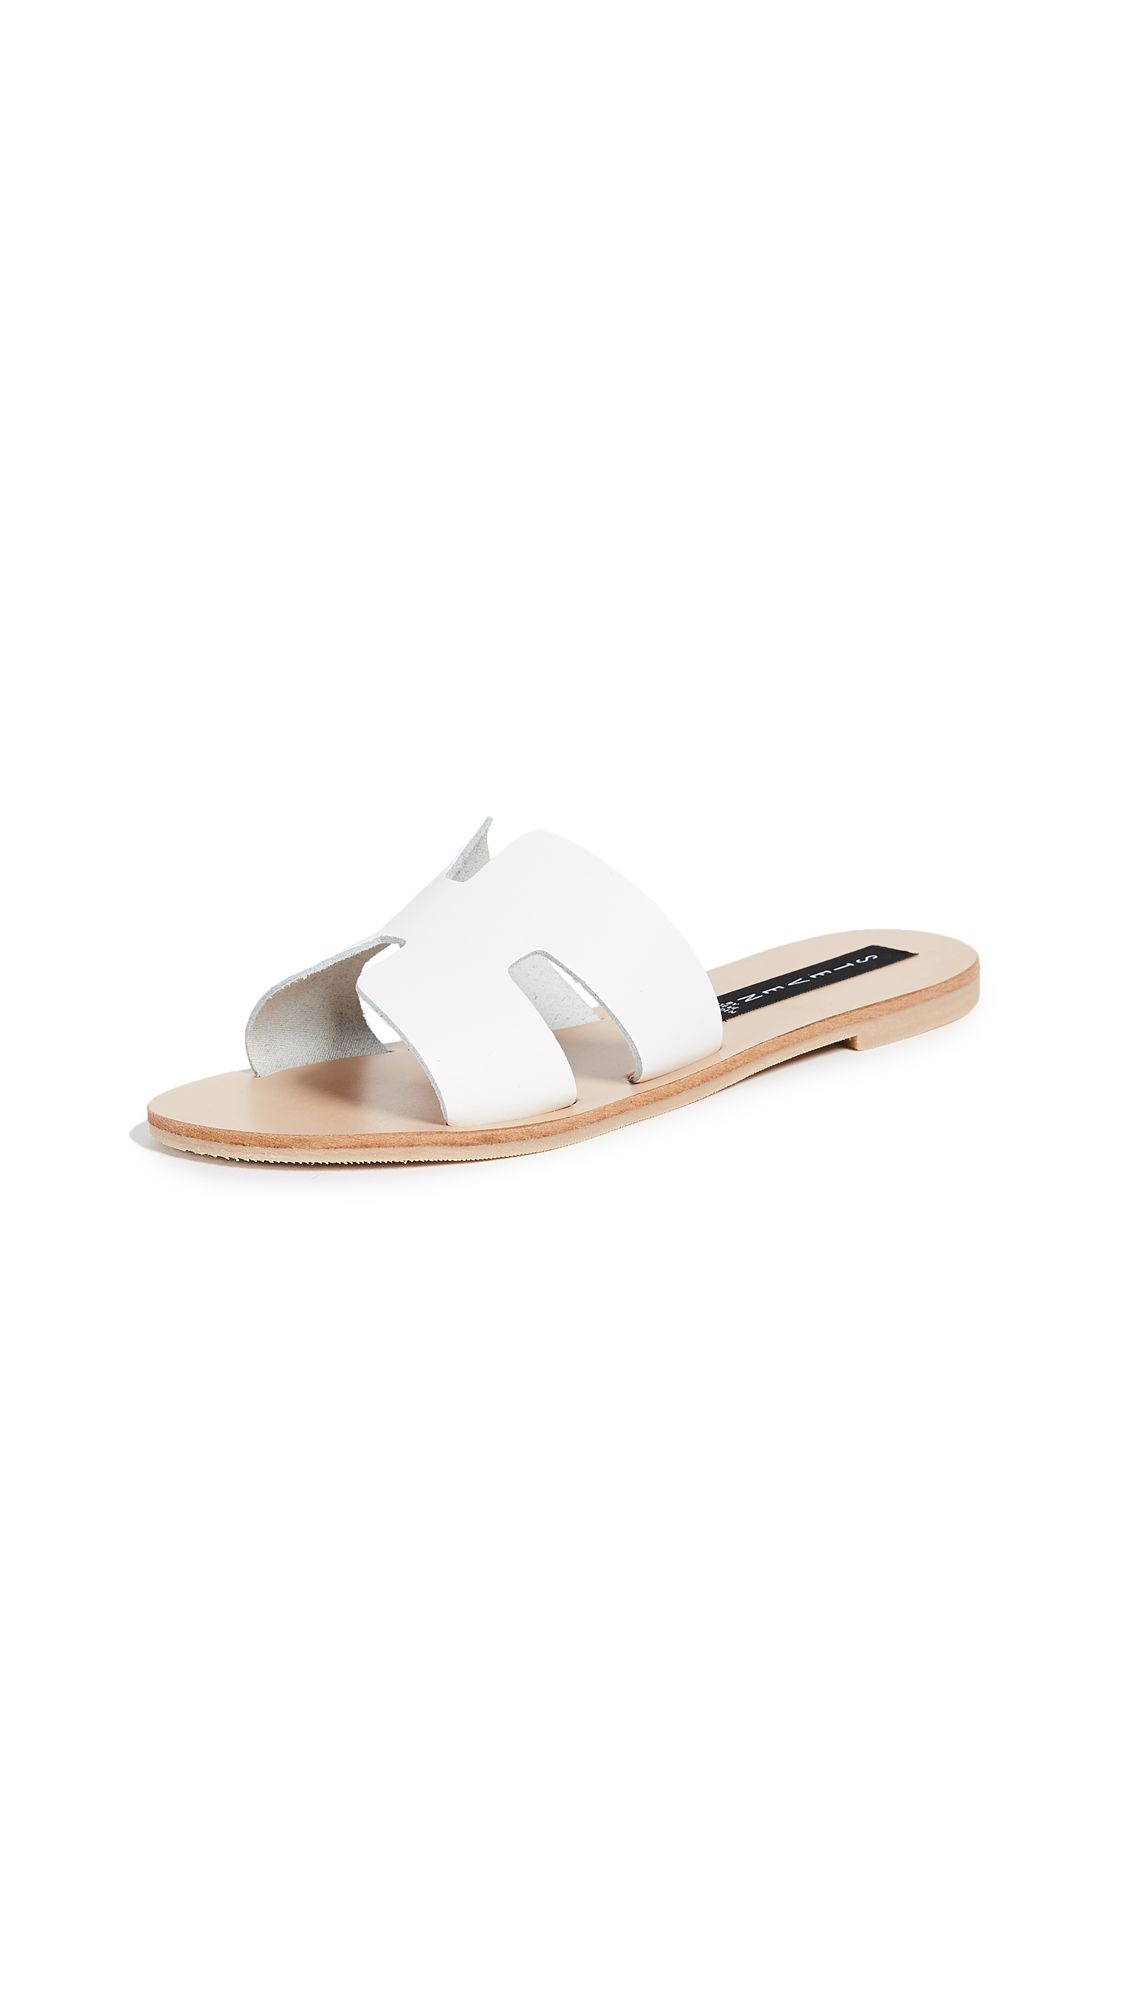 b84ca284114 LOVING these Steven Greece Slide sandals !Flat profile Rounded toe Open toe  affiliate.  fashion  sandals  summerfashion  footwear